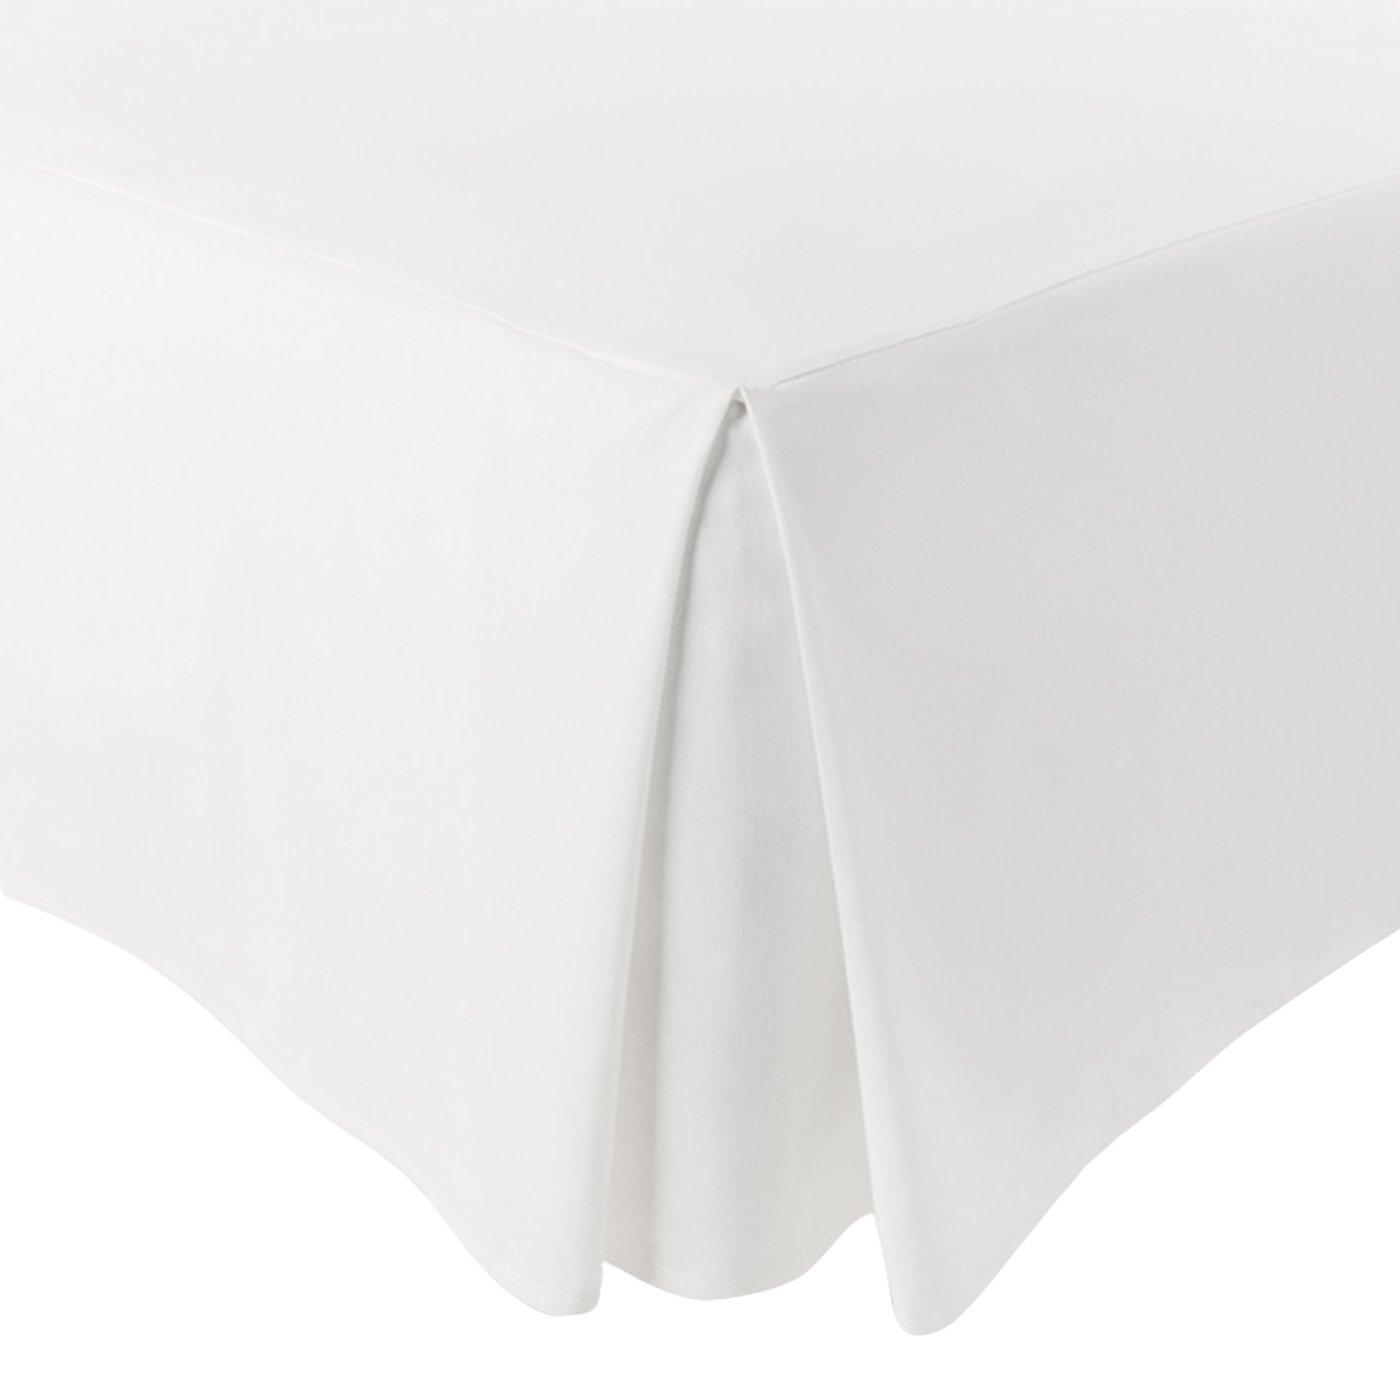 Jarrous Cubre Canapé Modelo Pierre, Color Blanco, Medida para Cama de 90 product image